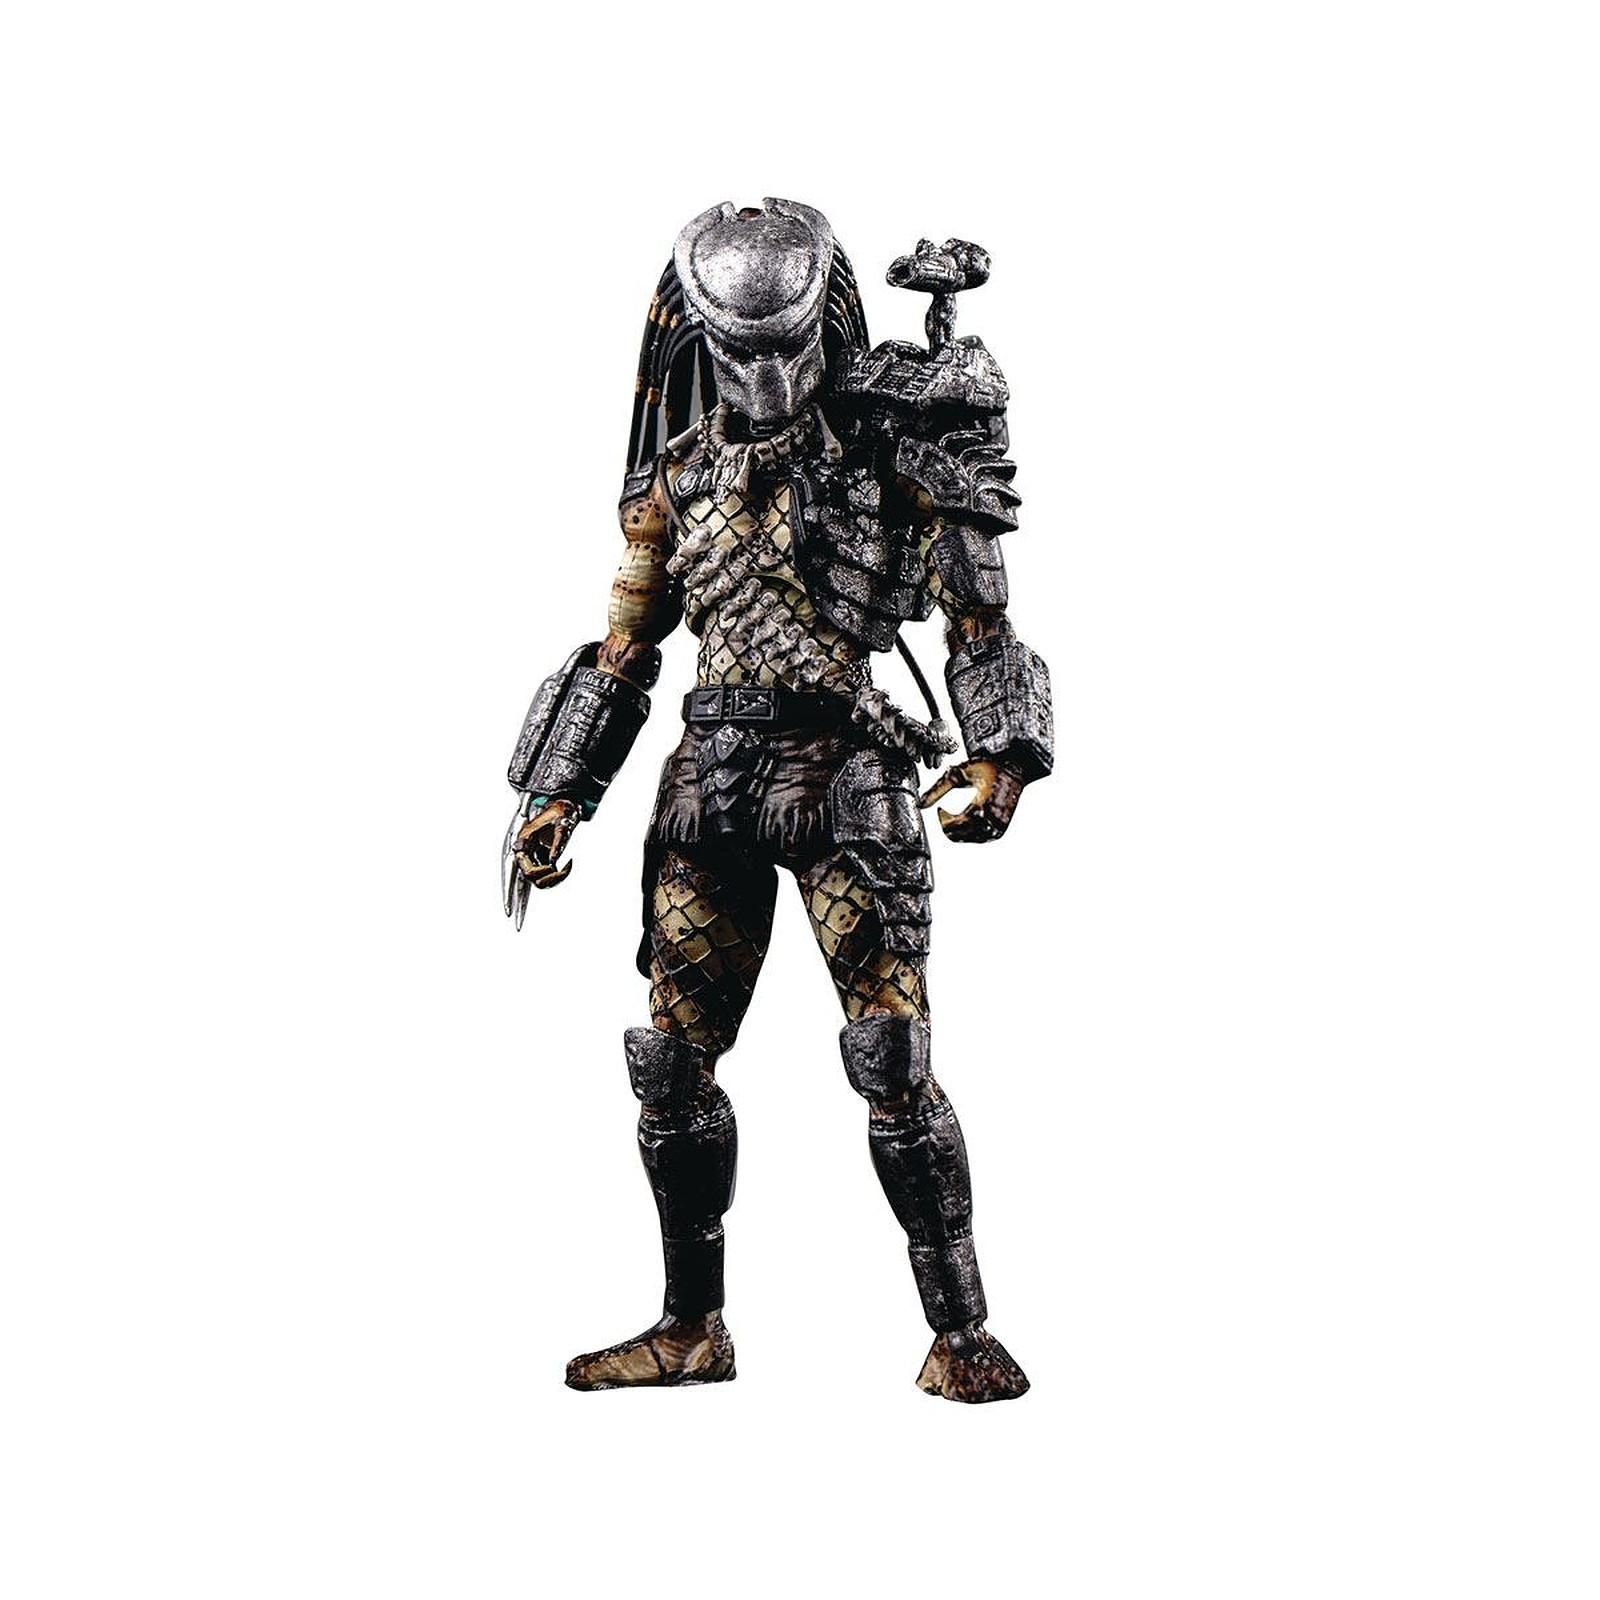 Predator - Figurine 1/18 Jungle Predator Previews Exclusive 11 cm